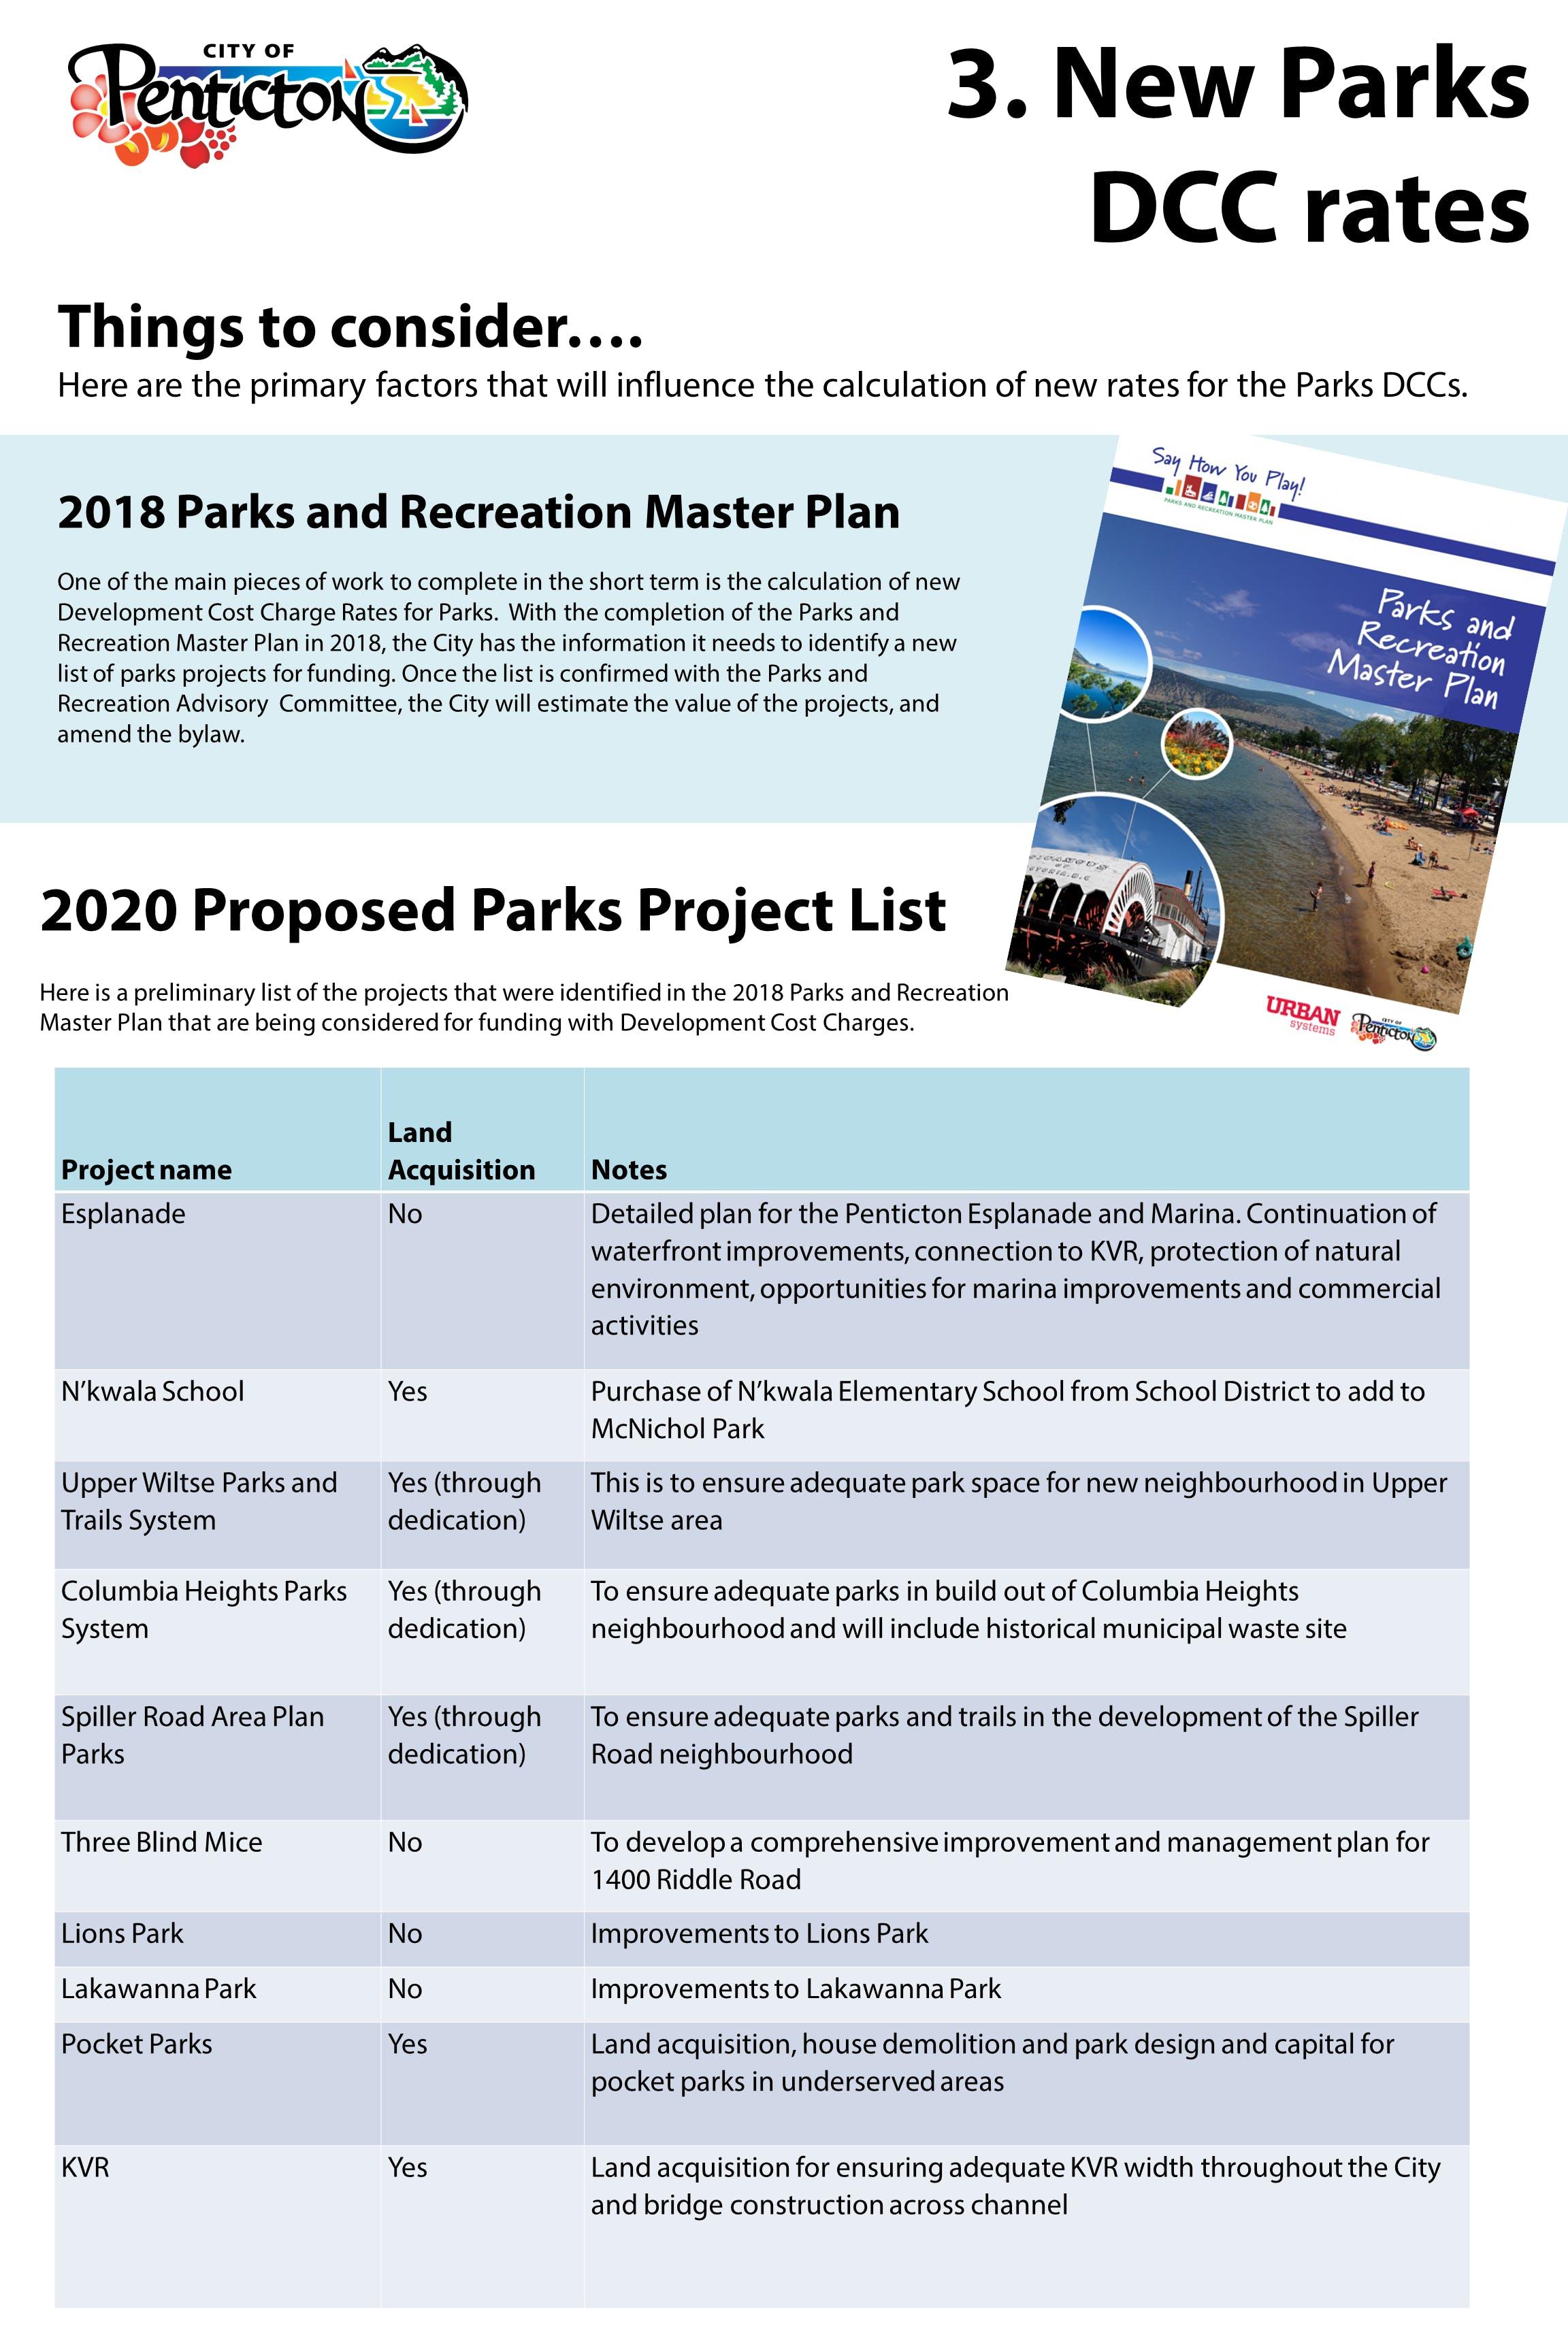 3. New DCC Parks rates